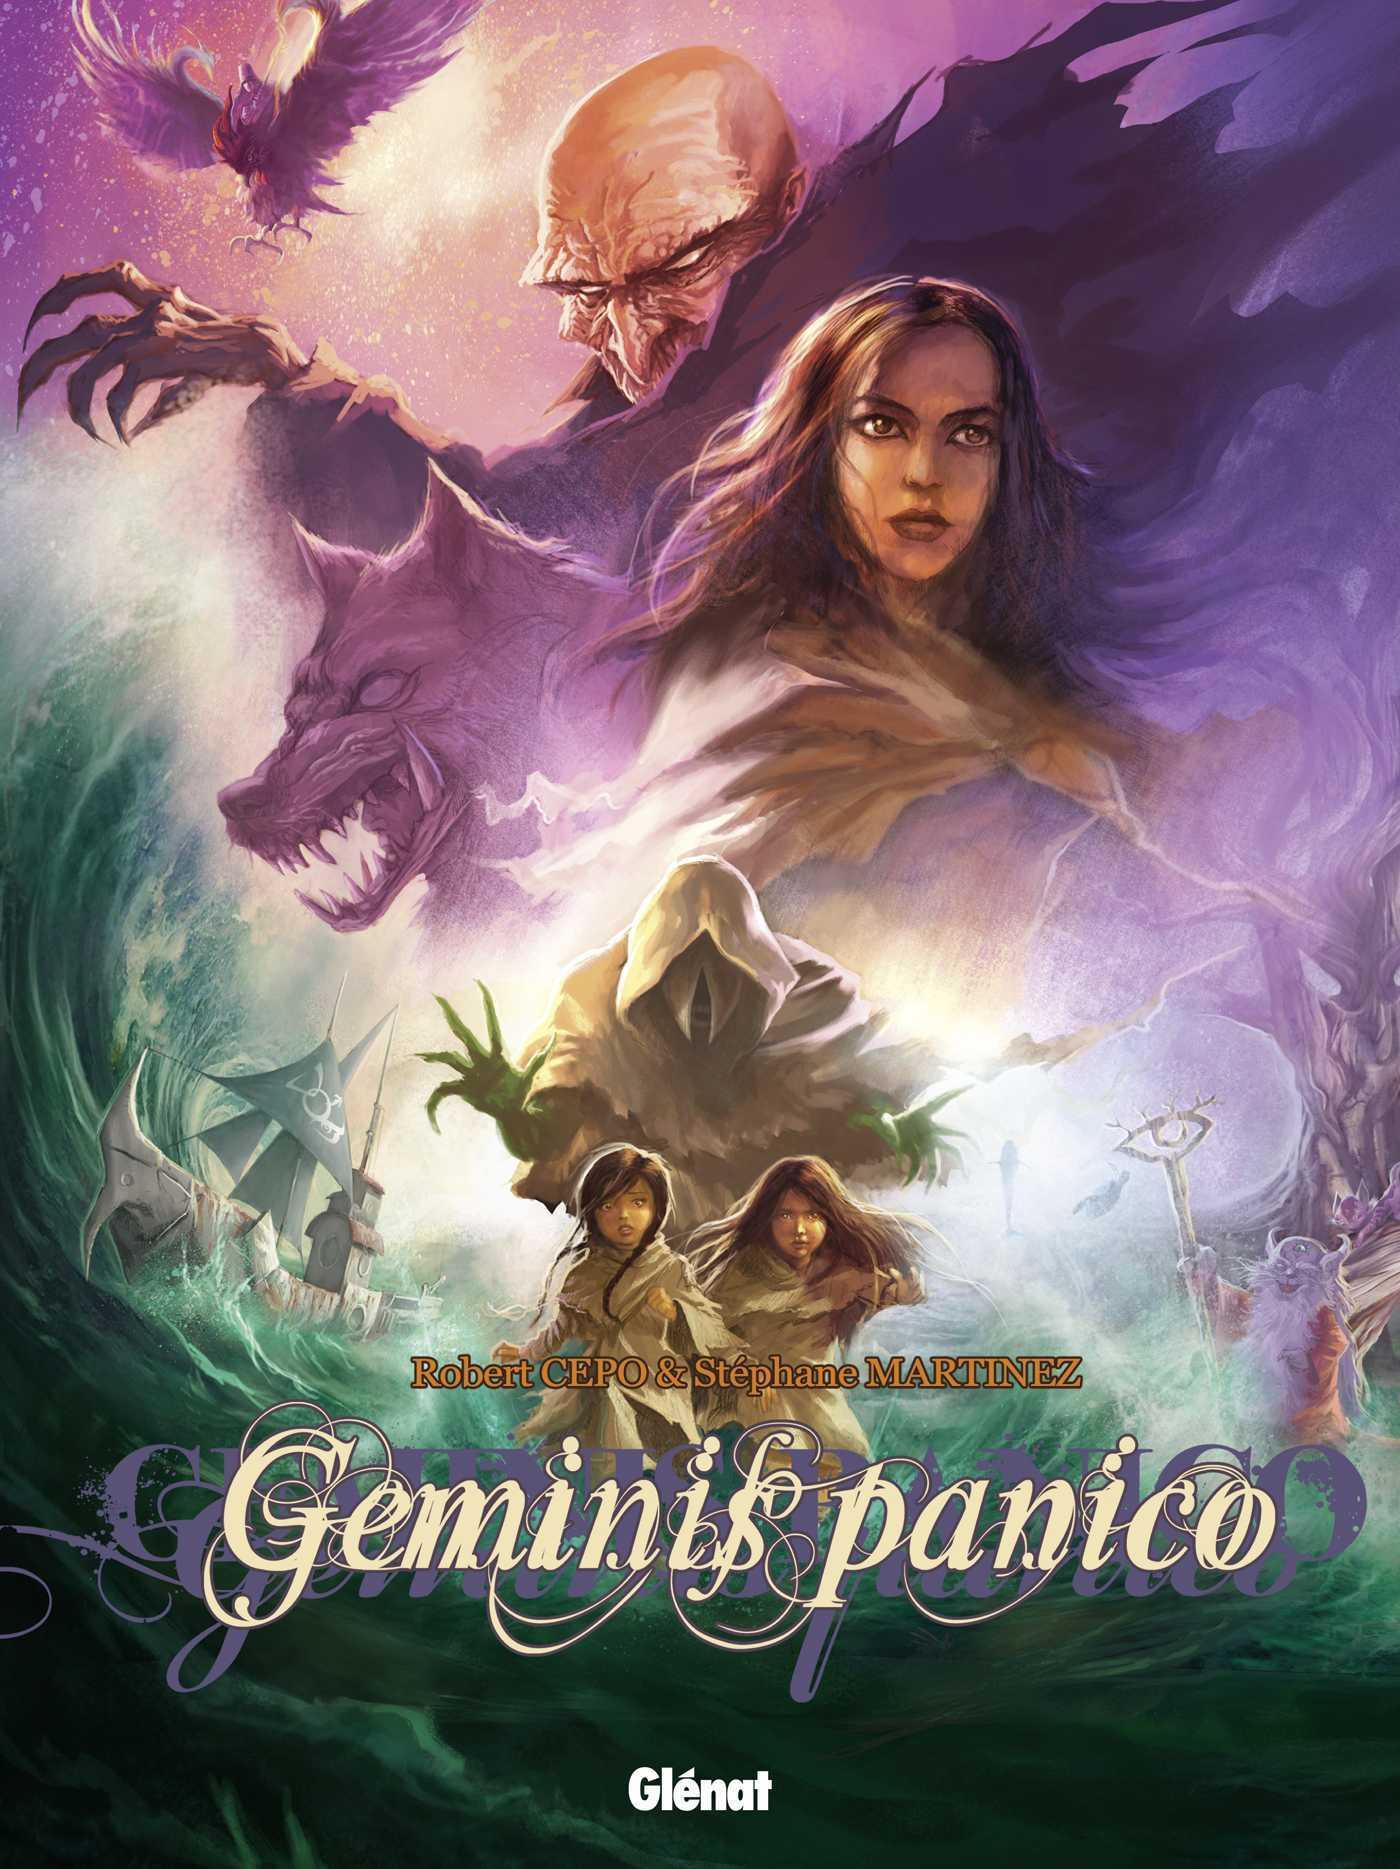 Geminis Panico T2, la fuite du démoniaque docteur Zmurder